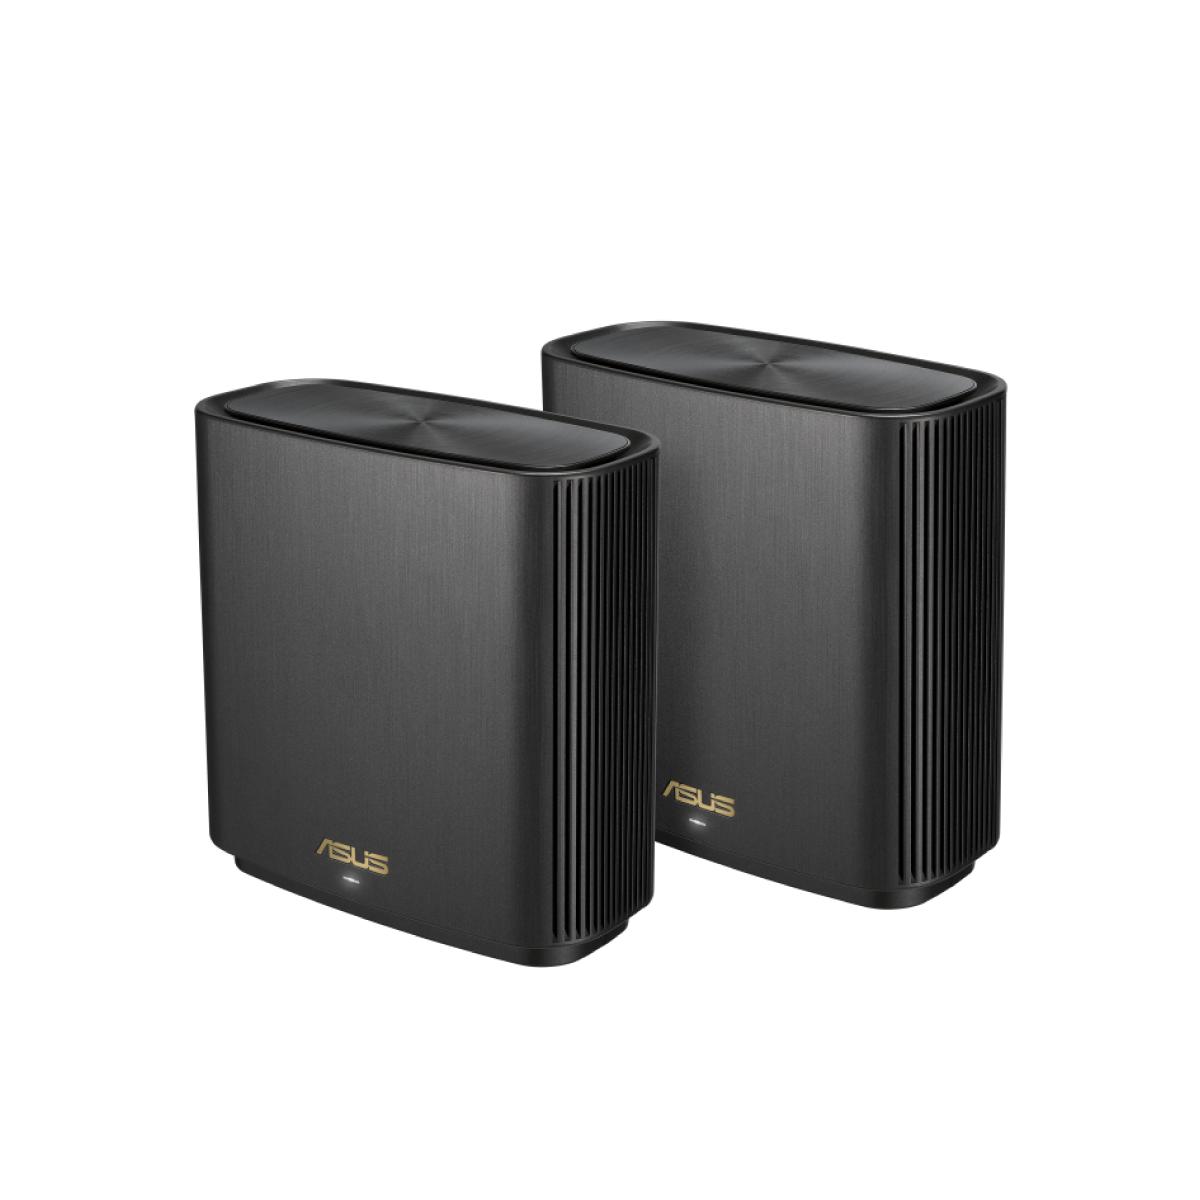 AX6600 Tri Band Mesh WiFi System